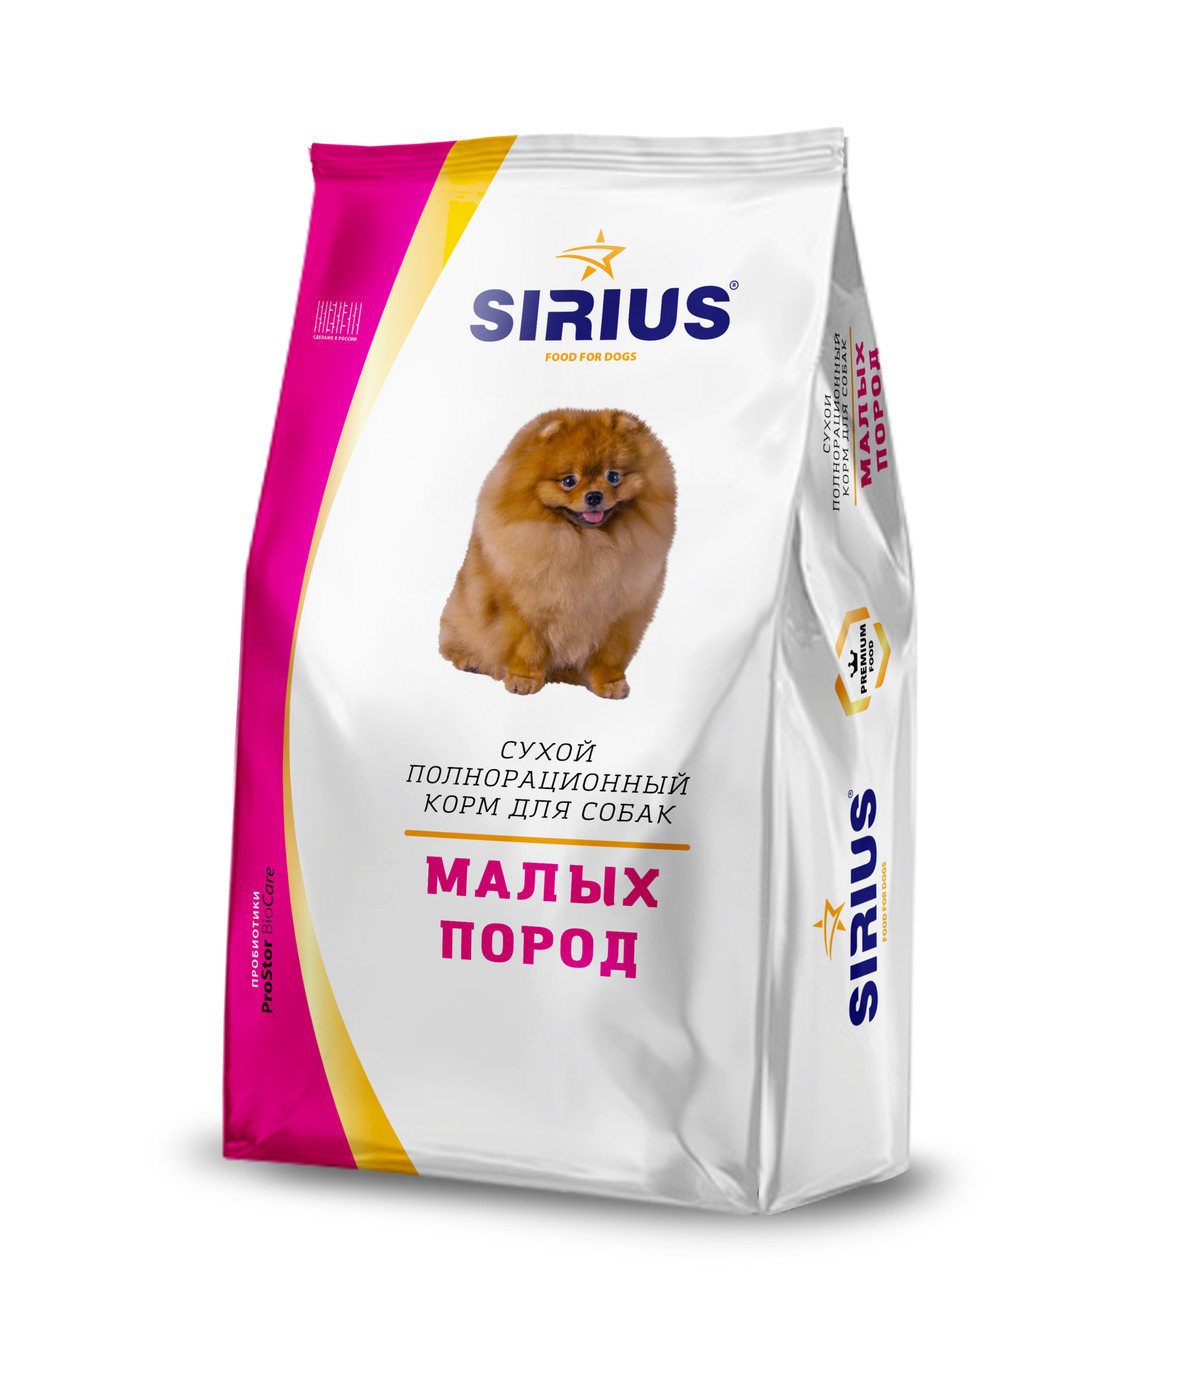 Сухой корм ТМ «SIRIUS» для взрослых собак мелких пород, 3